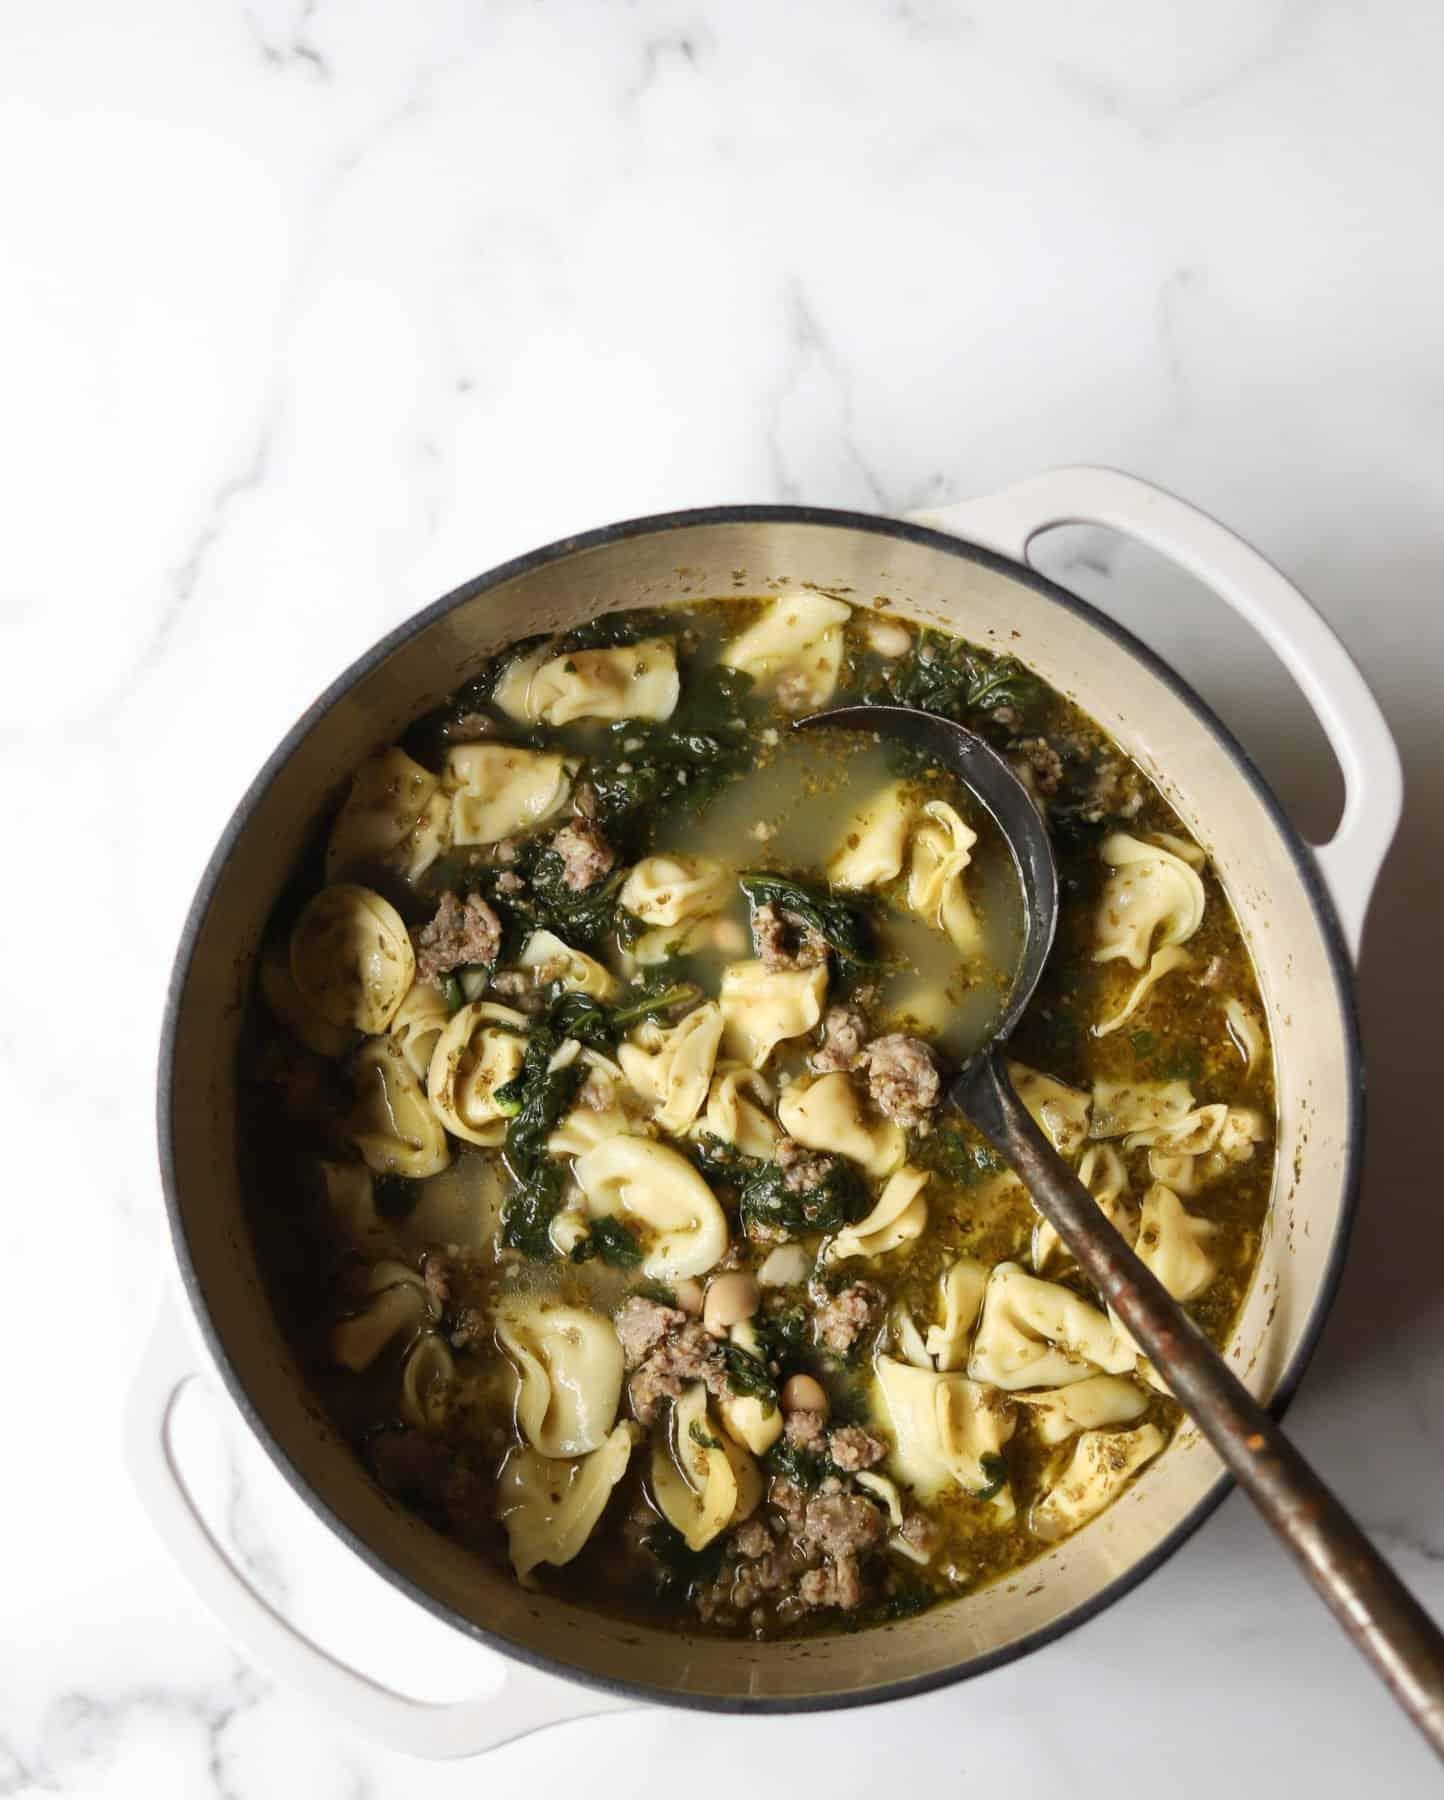 Tortellini soup in a white pot